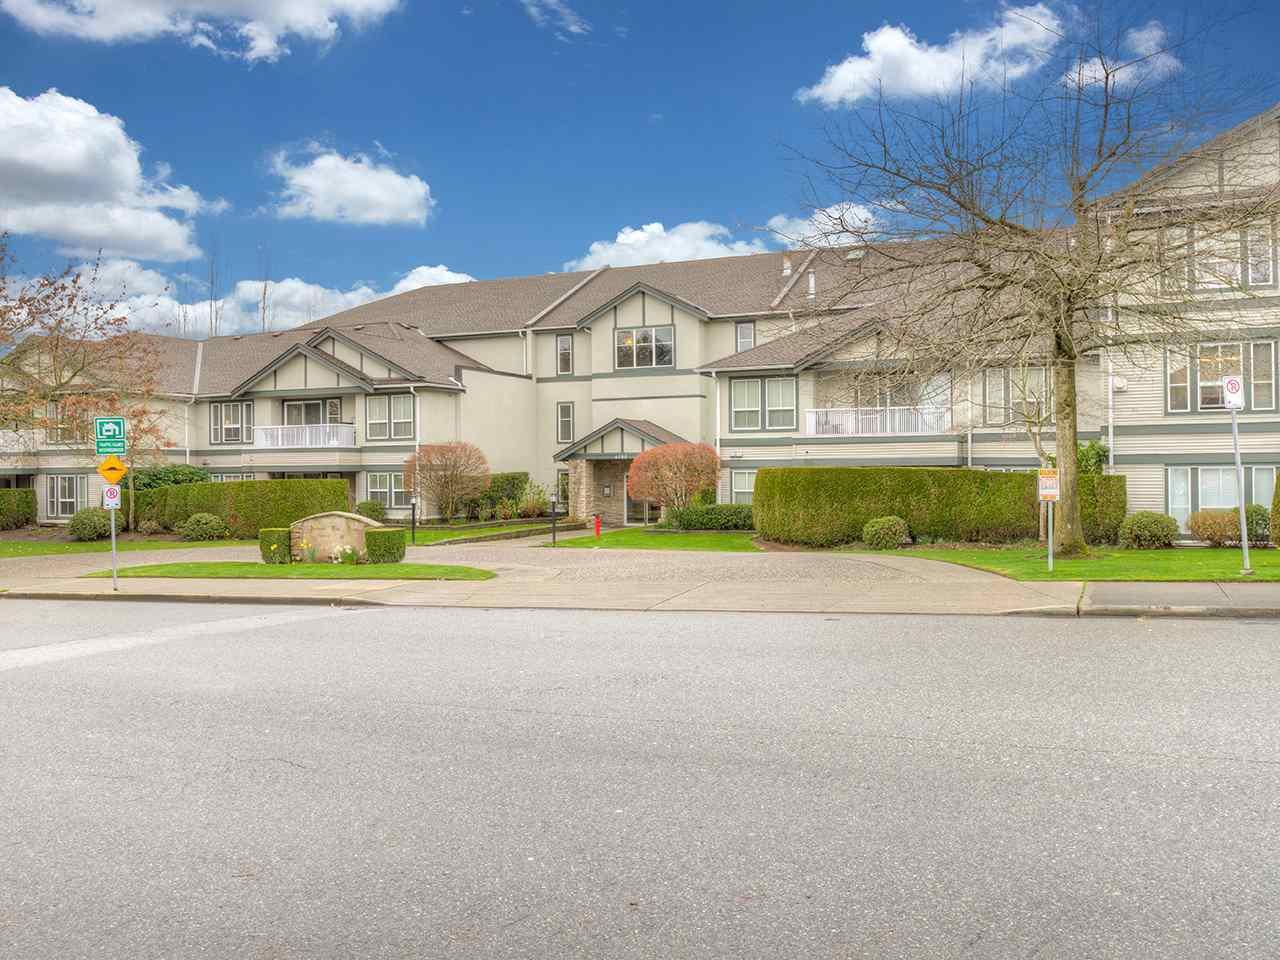 Main Photo: 201 6385 121 STREET in Surrey: Panorama Ridge Condo for sale : MLS®# R2045917